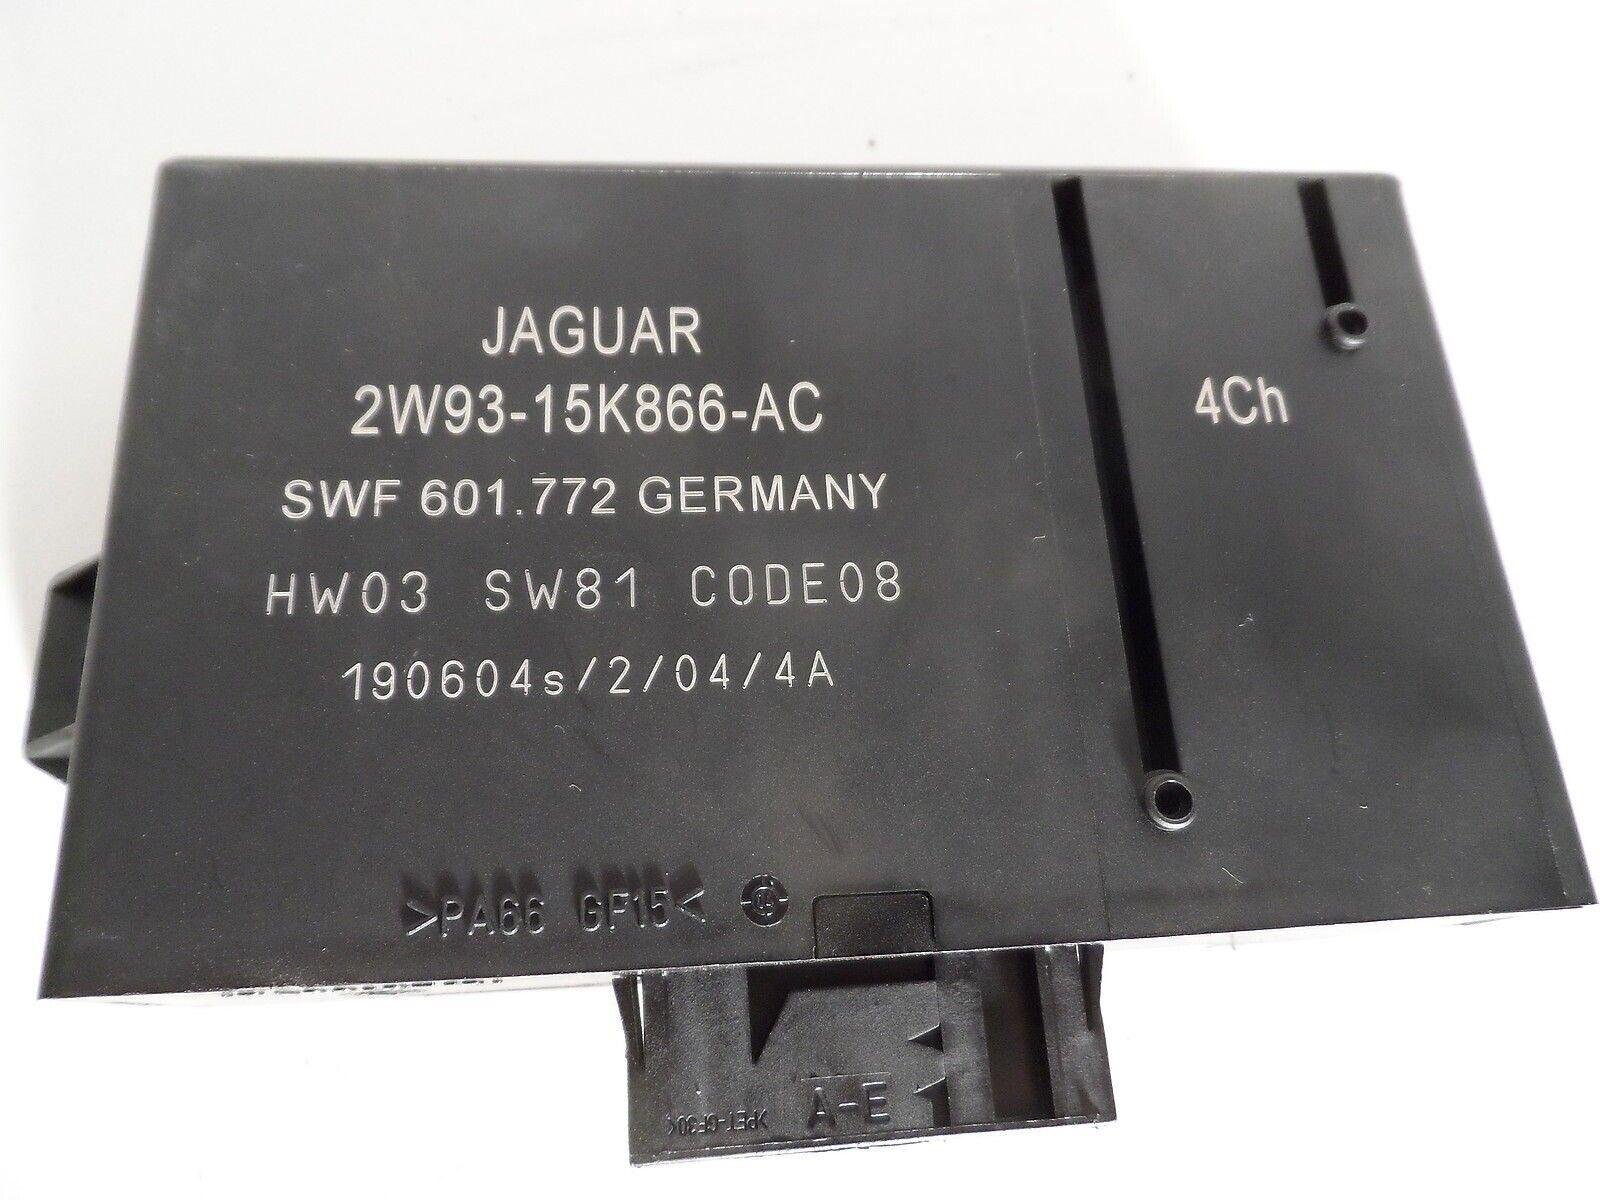 JAGUAR XJ8 XK8 XKR 1998-2003 OEM USED RELAY BROWN LJA 6703 AA LJA6703AA